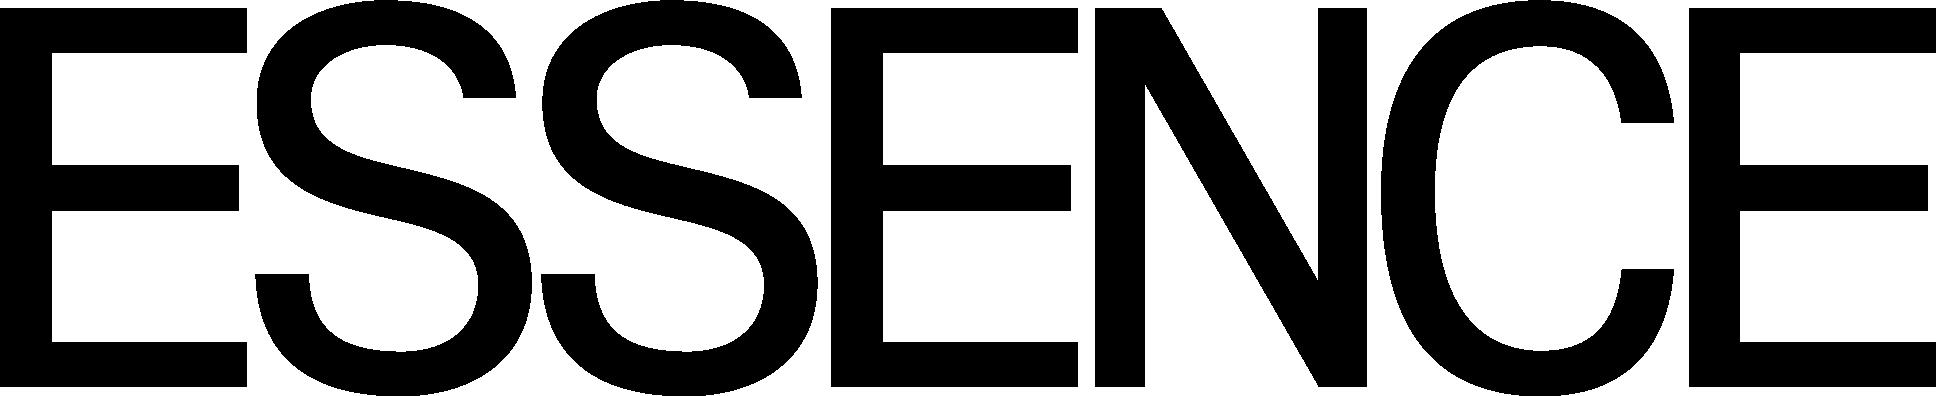 Essence Logo Png - Essence Magazine , Transparent Cartoon - Jing.fm